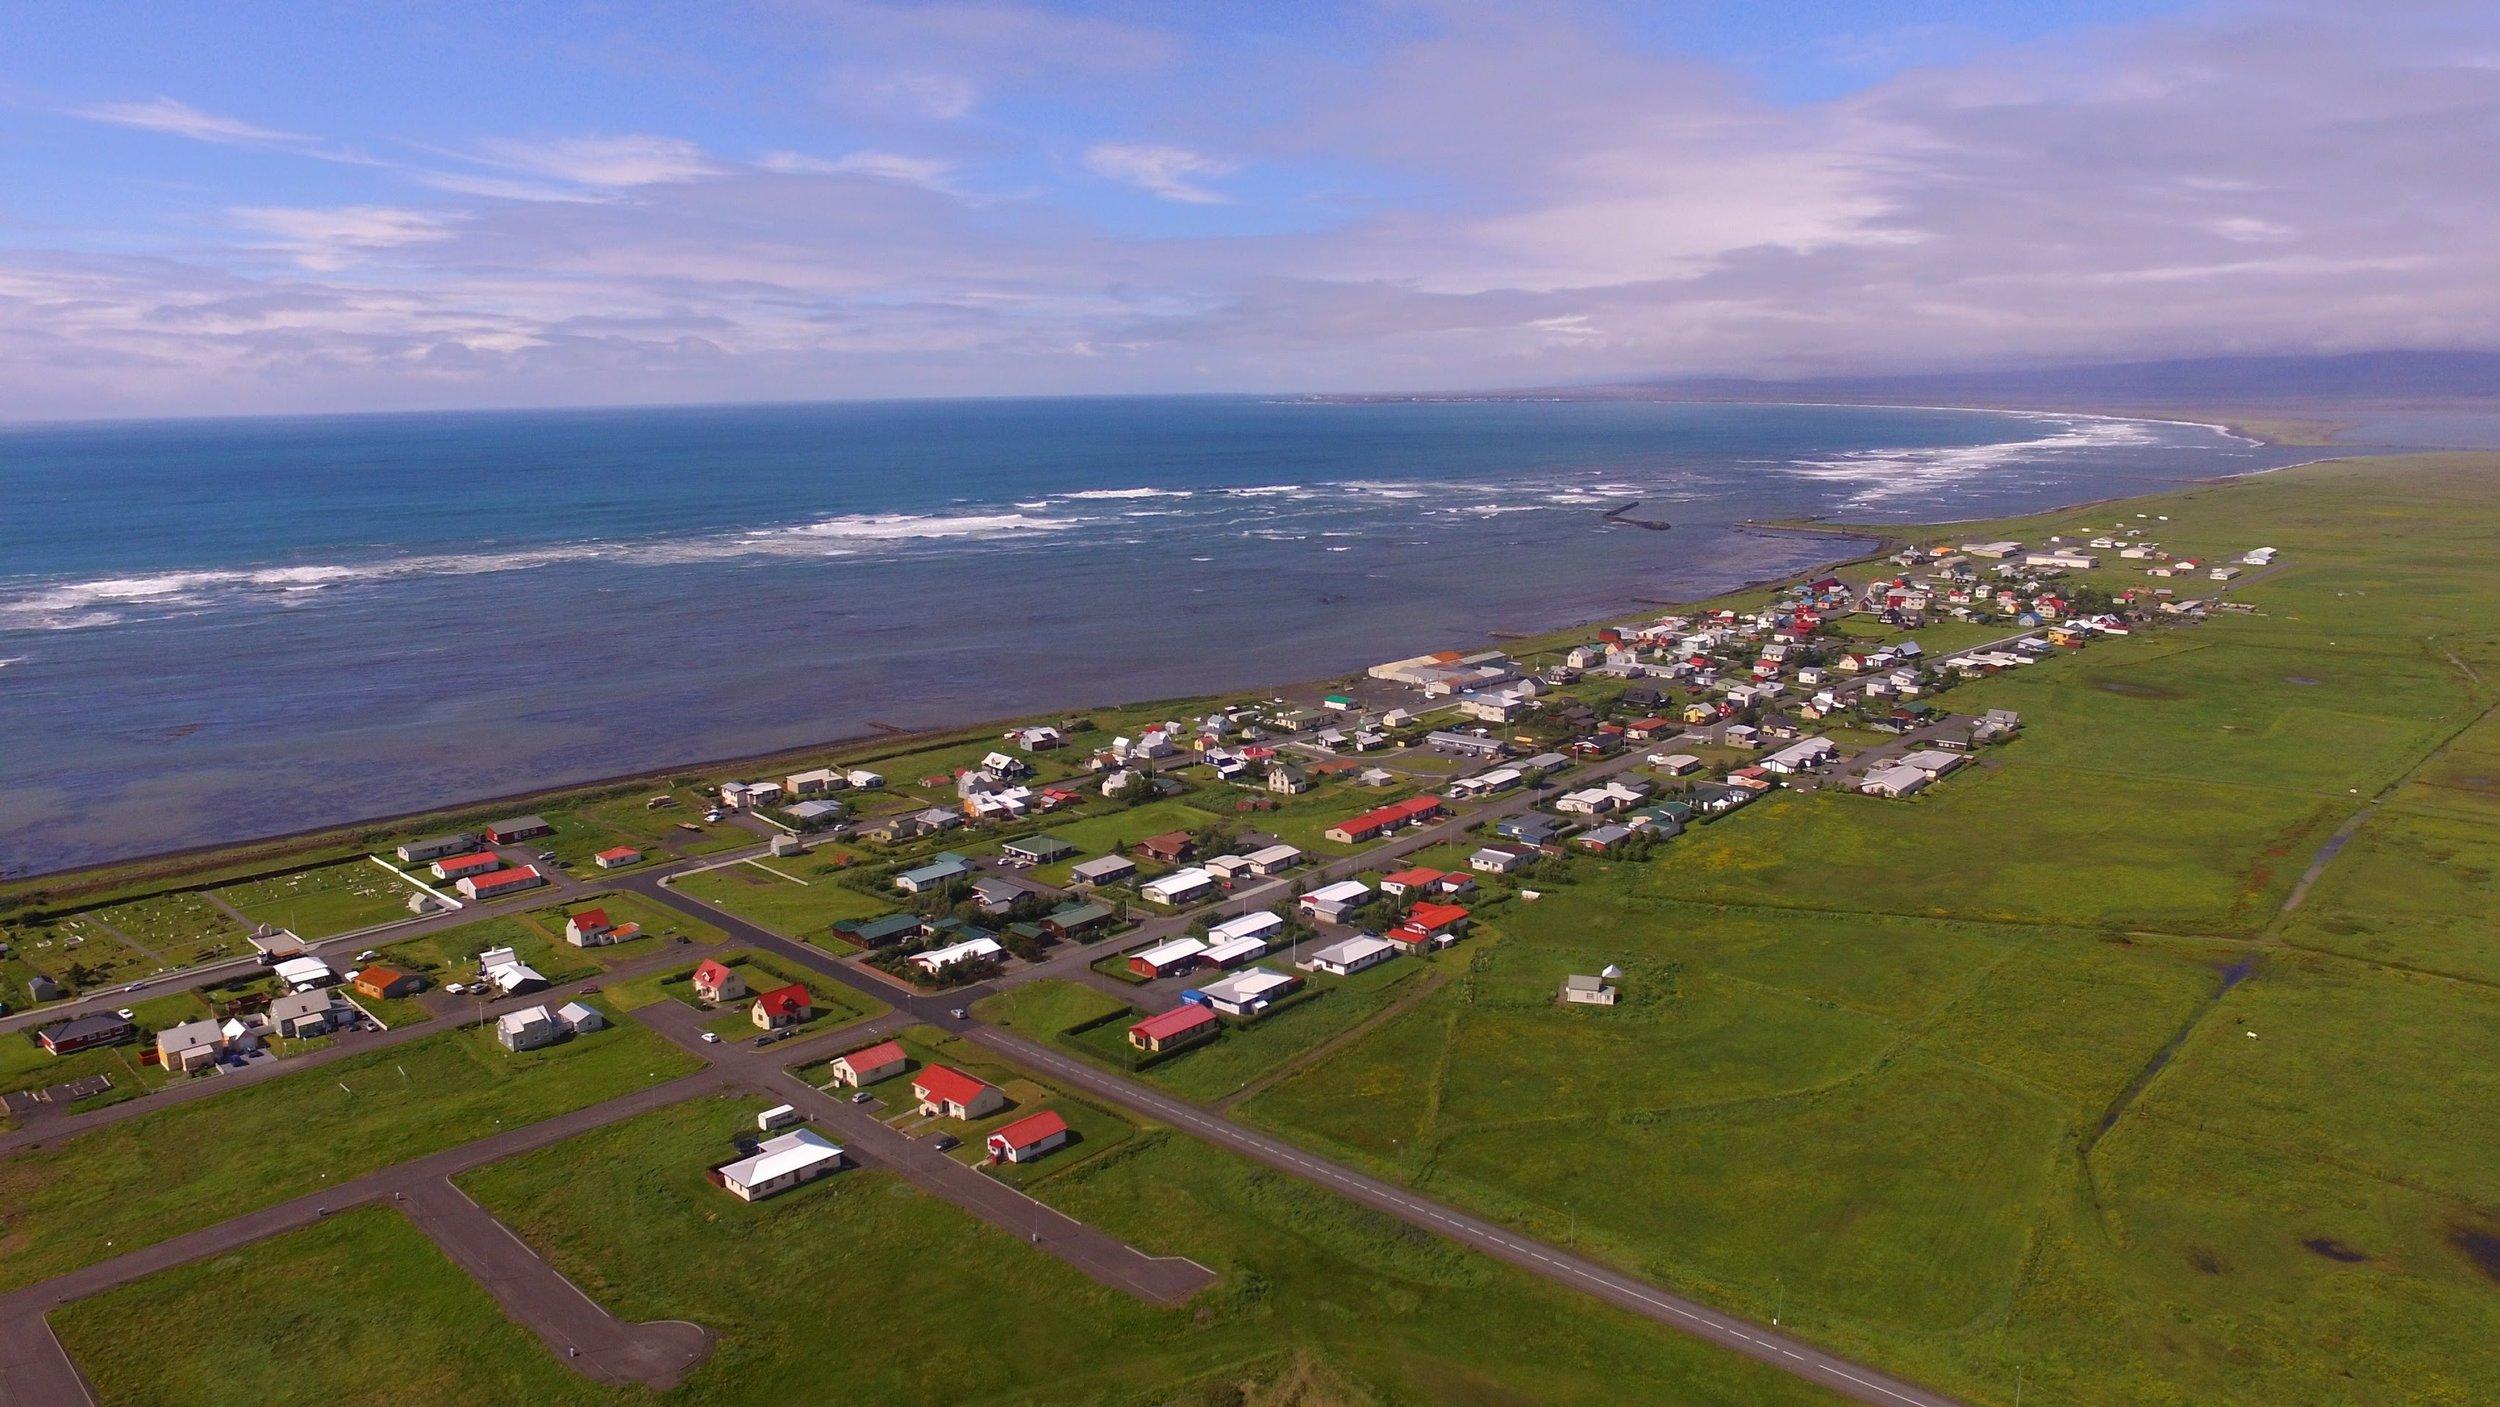 Einkofi Production is based on the beautiful south coast of Iceland